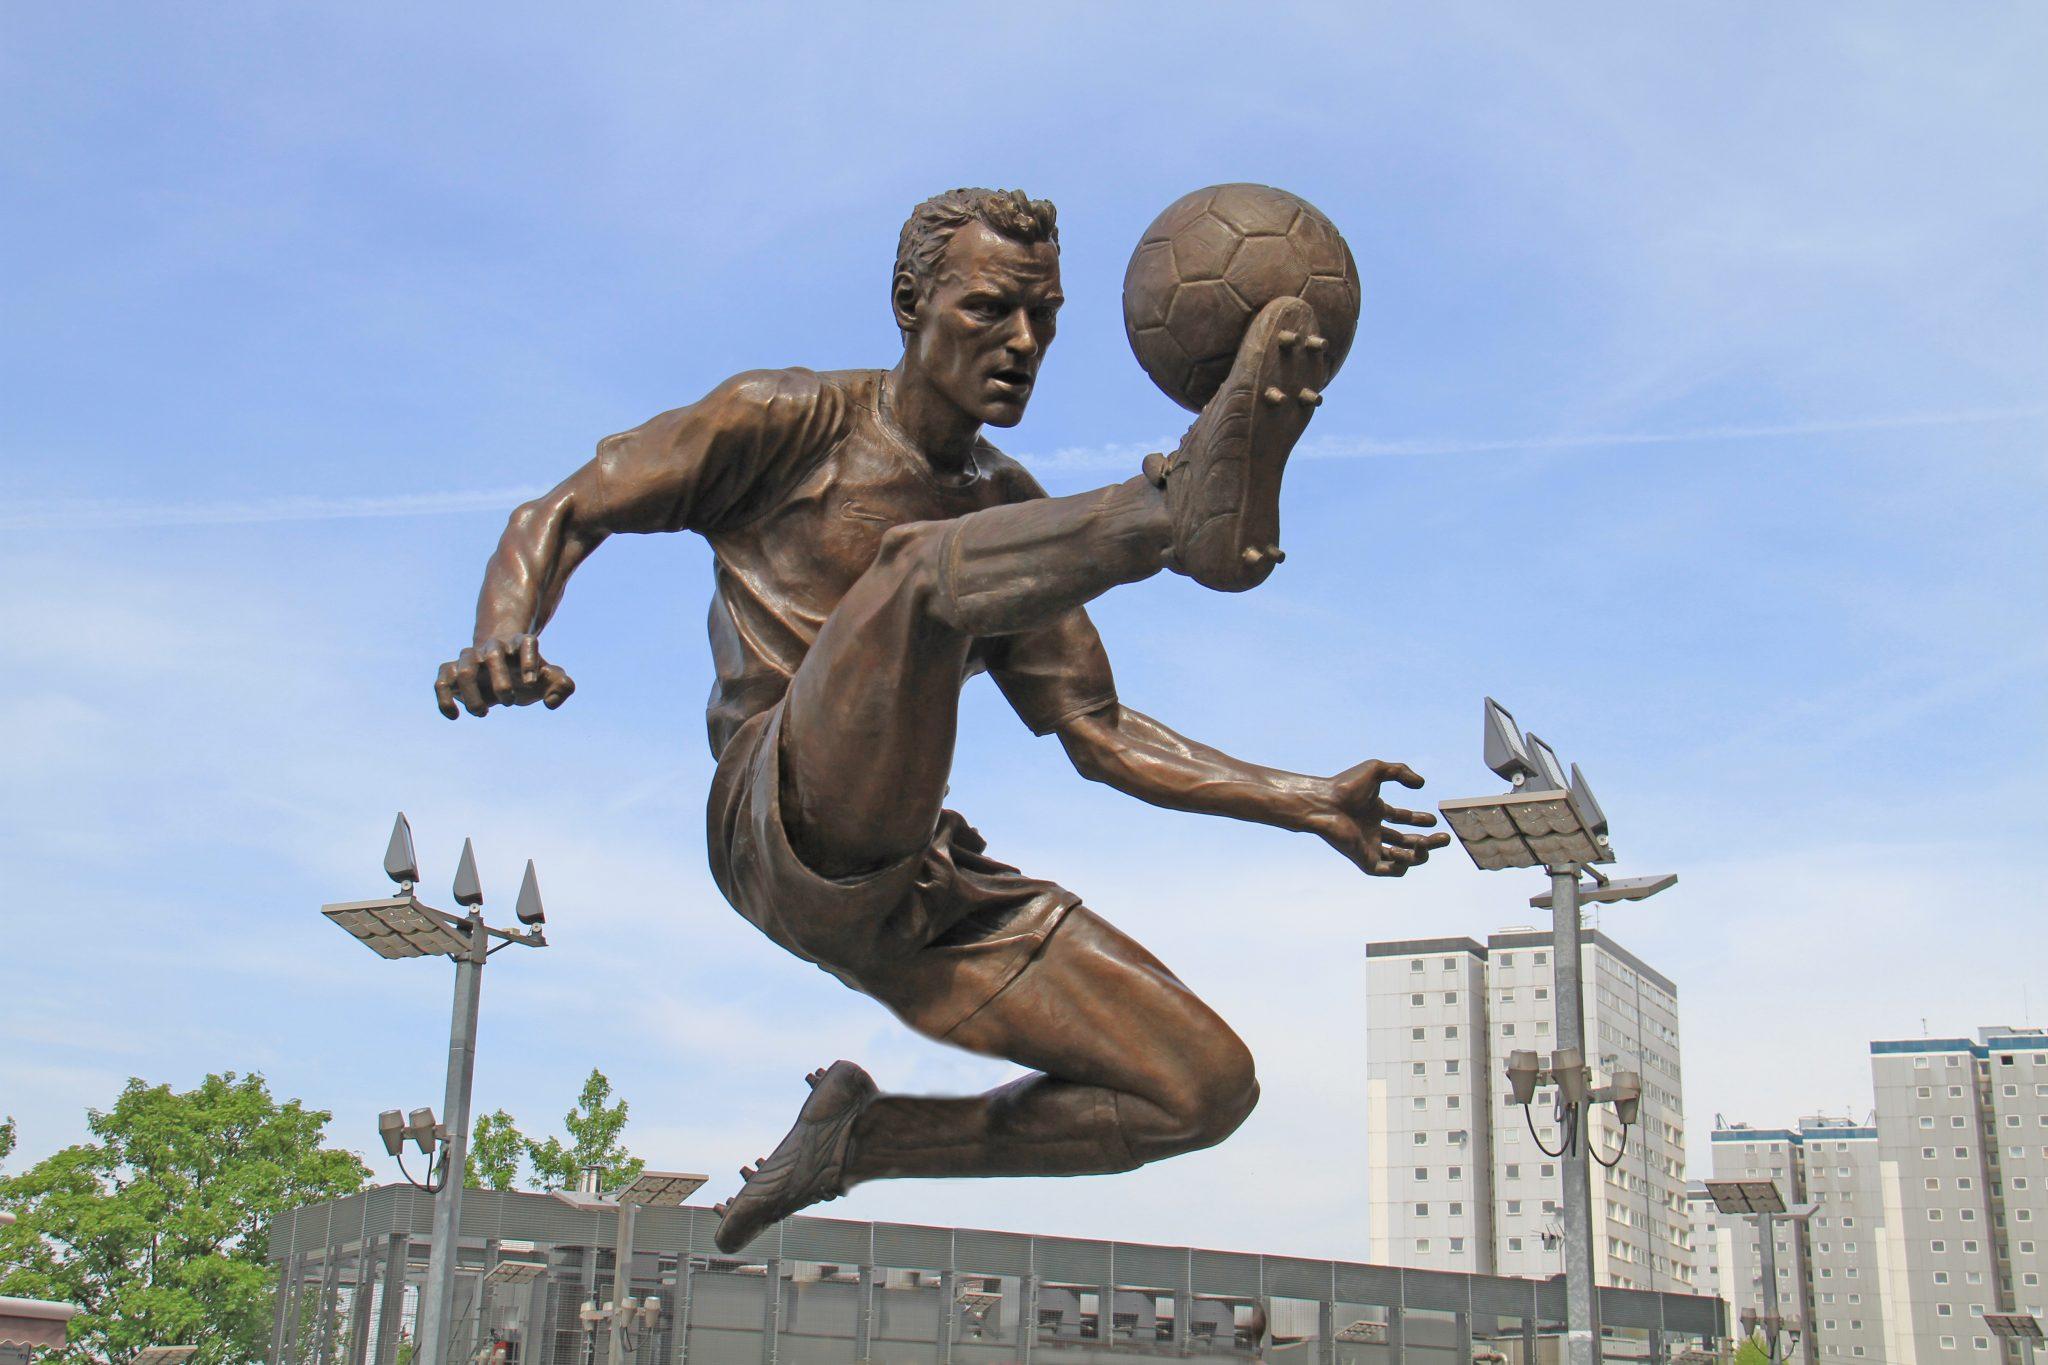 Dennis_Bergkamp_statue_2.jpg